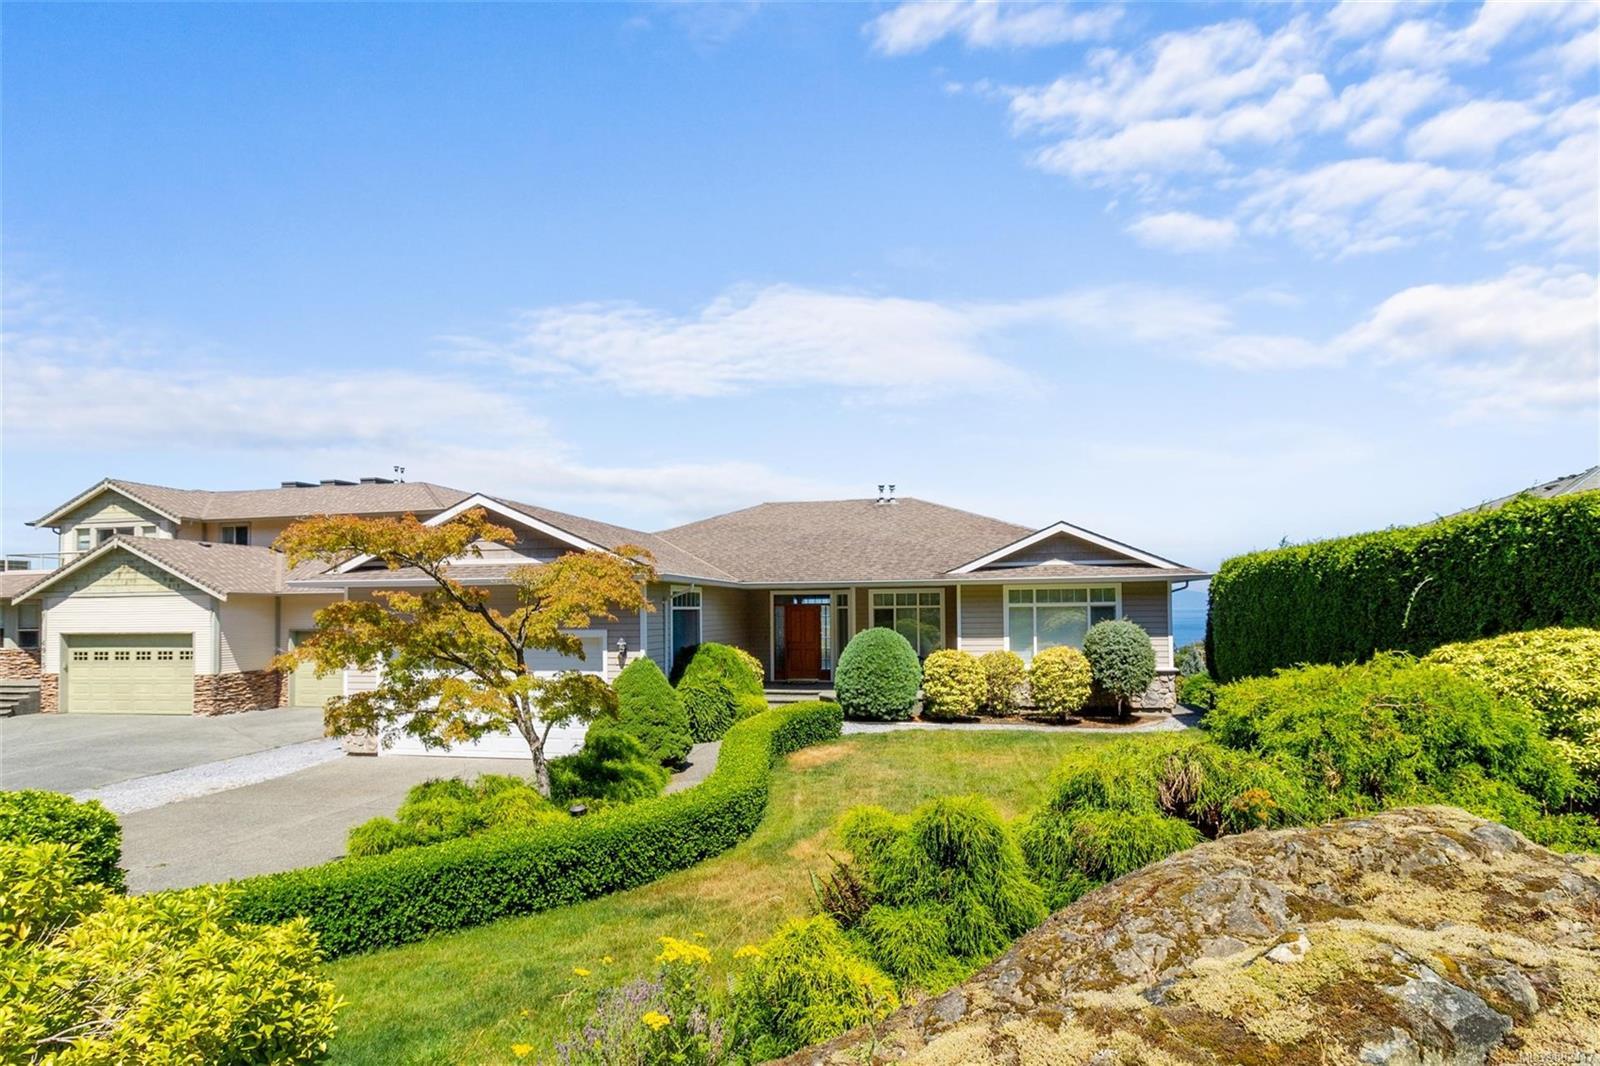 4913 Finnerty Crescent, Nanaimo